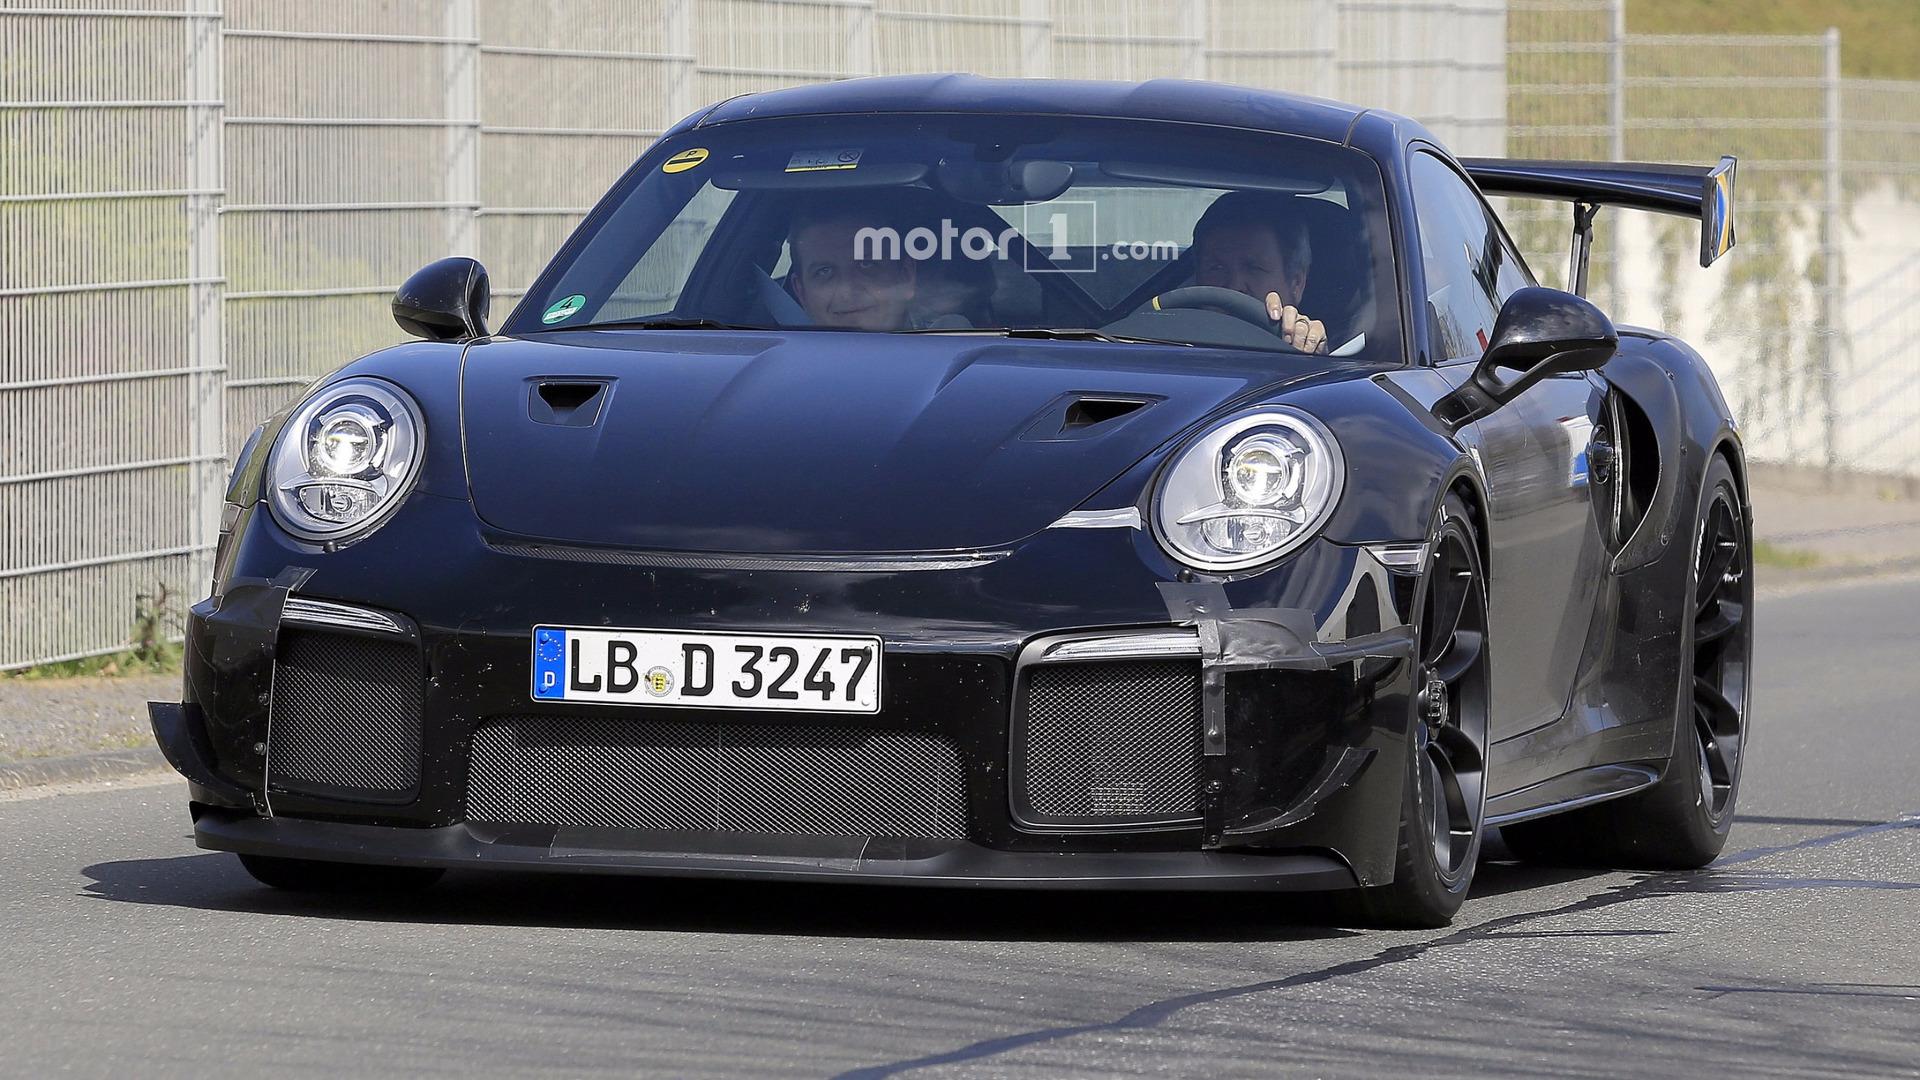 2018-porsche-911-gt2-spy-photo Stunning Porsche 911 Gt2 Body Kit Cars Trend